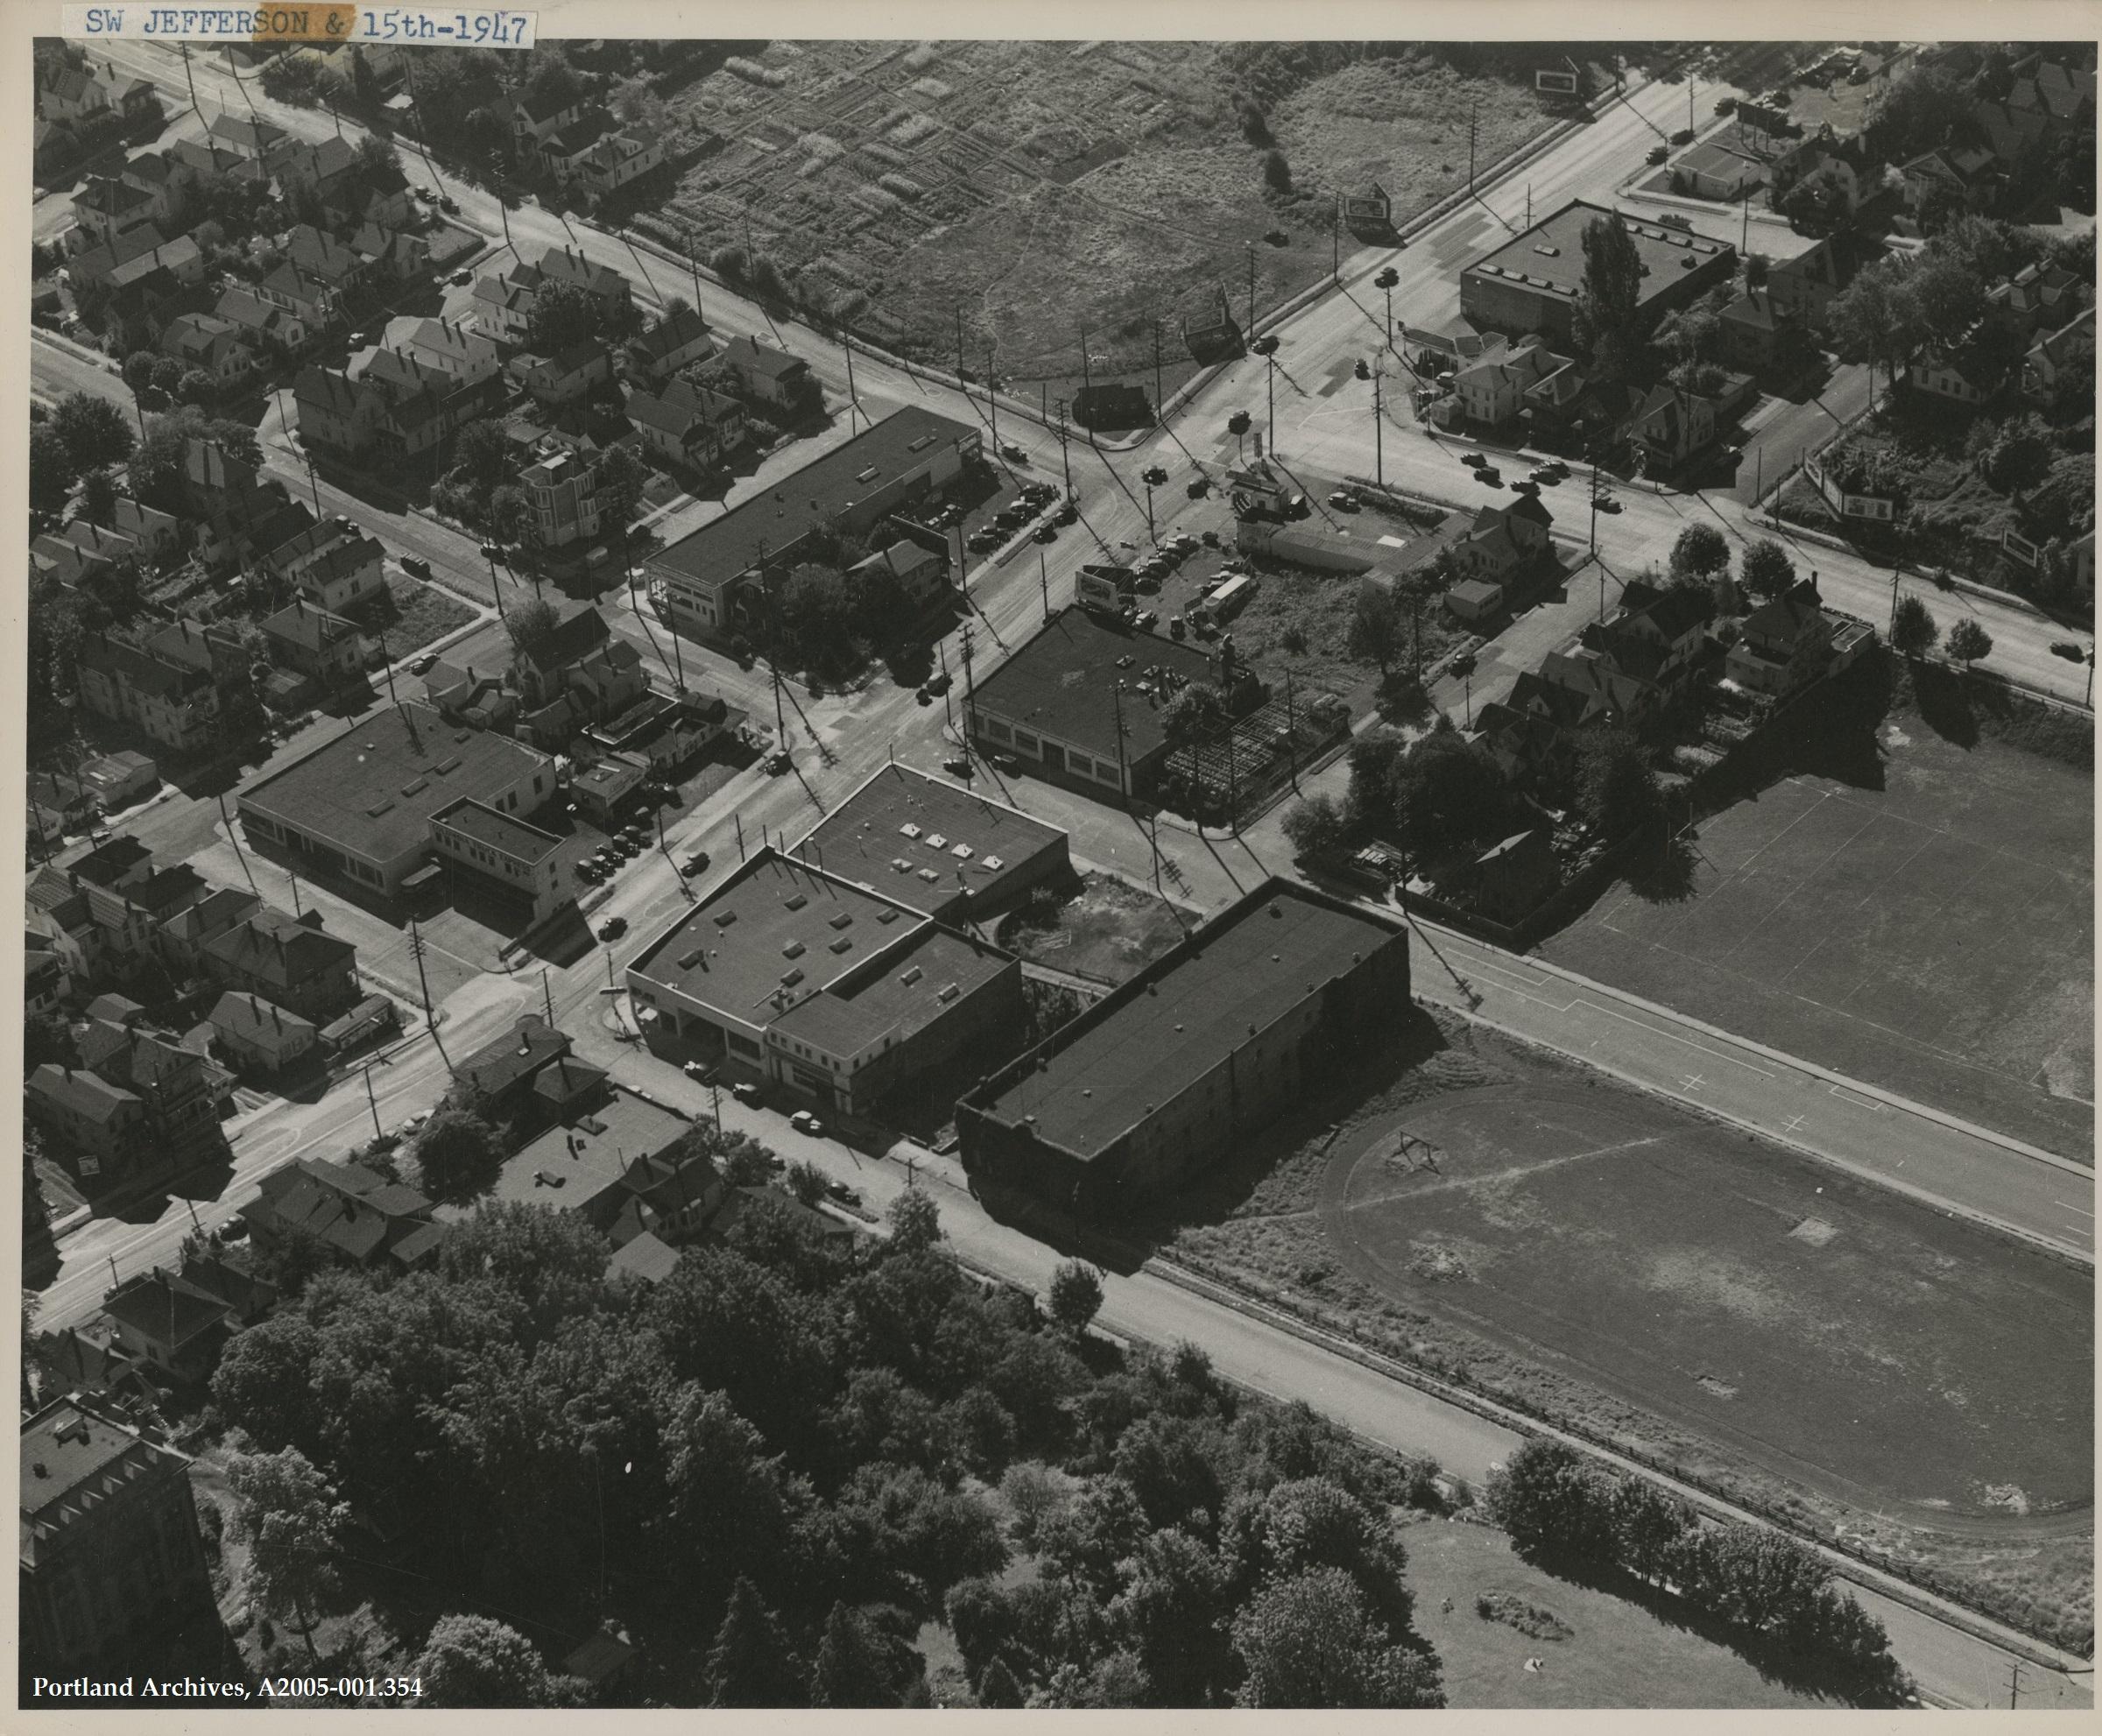 City of Portland Archives, Oregon, A2005-001.354